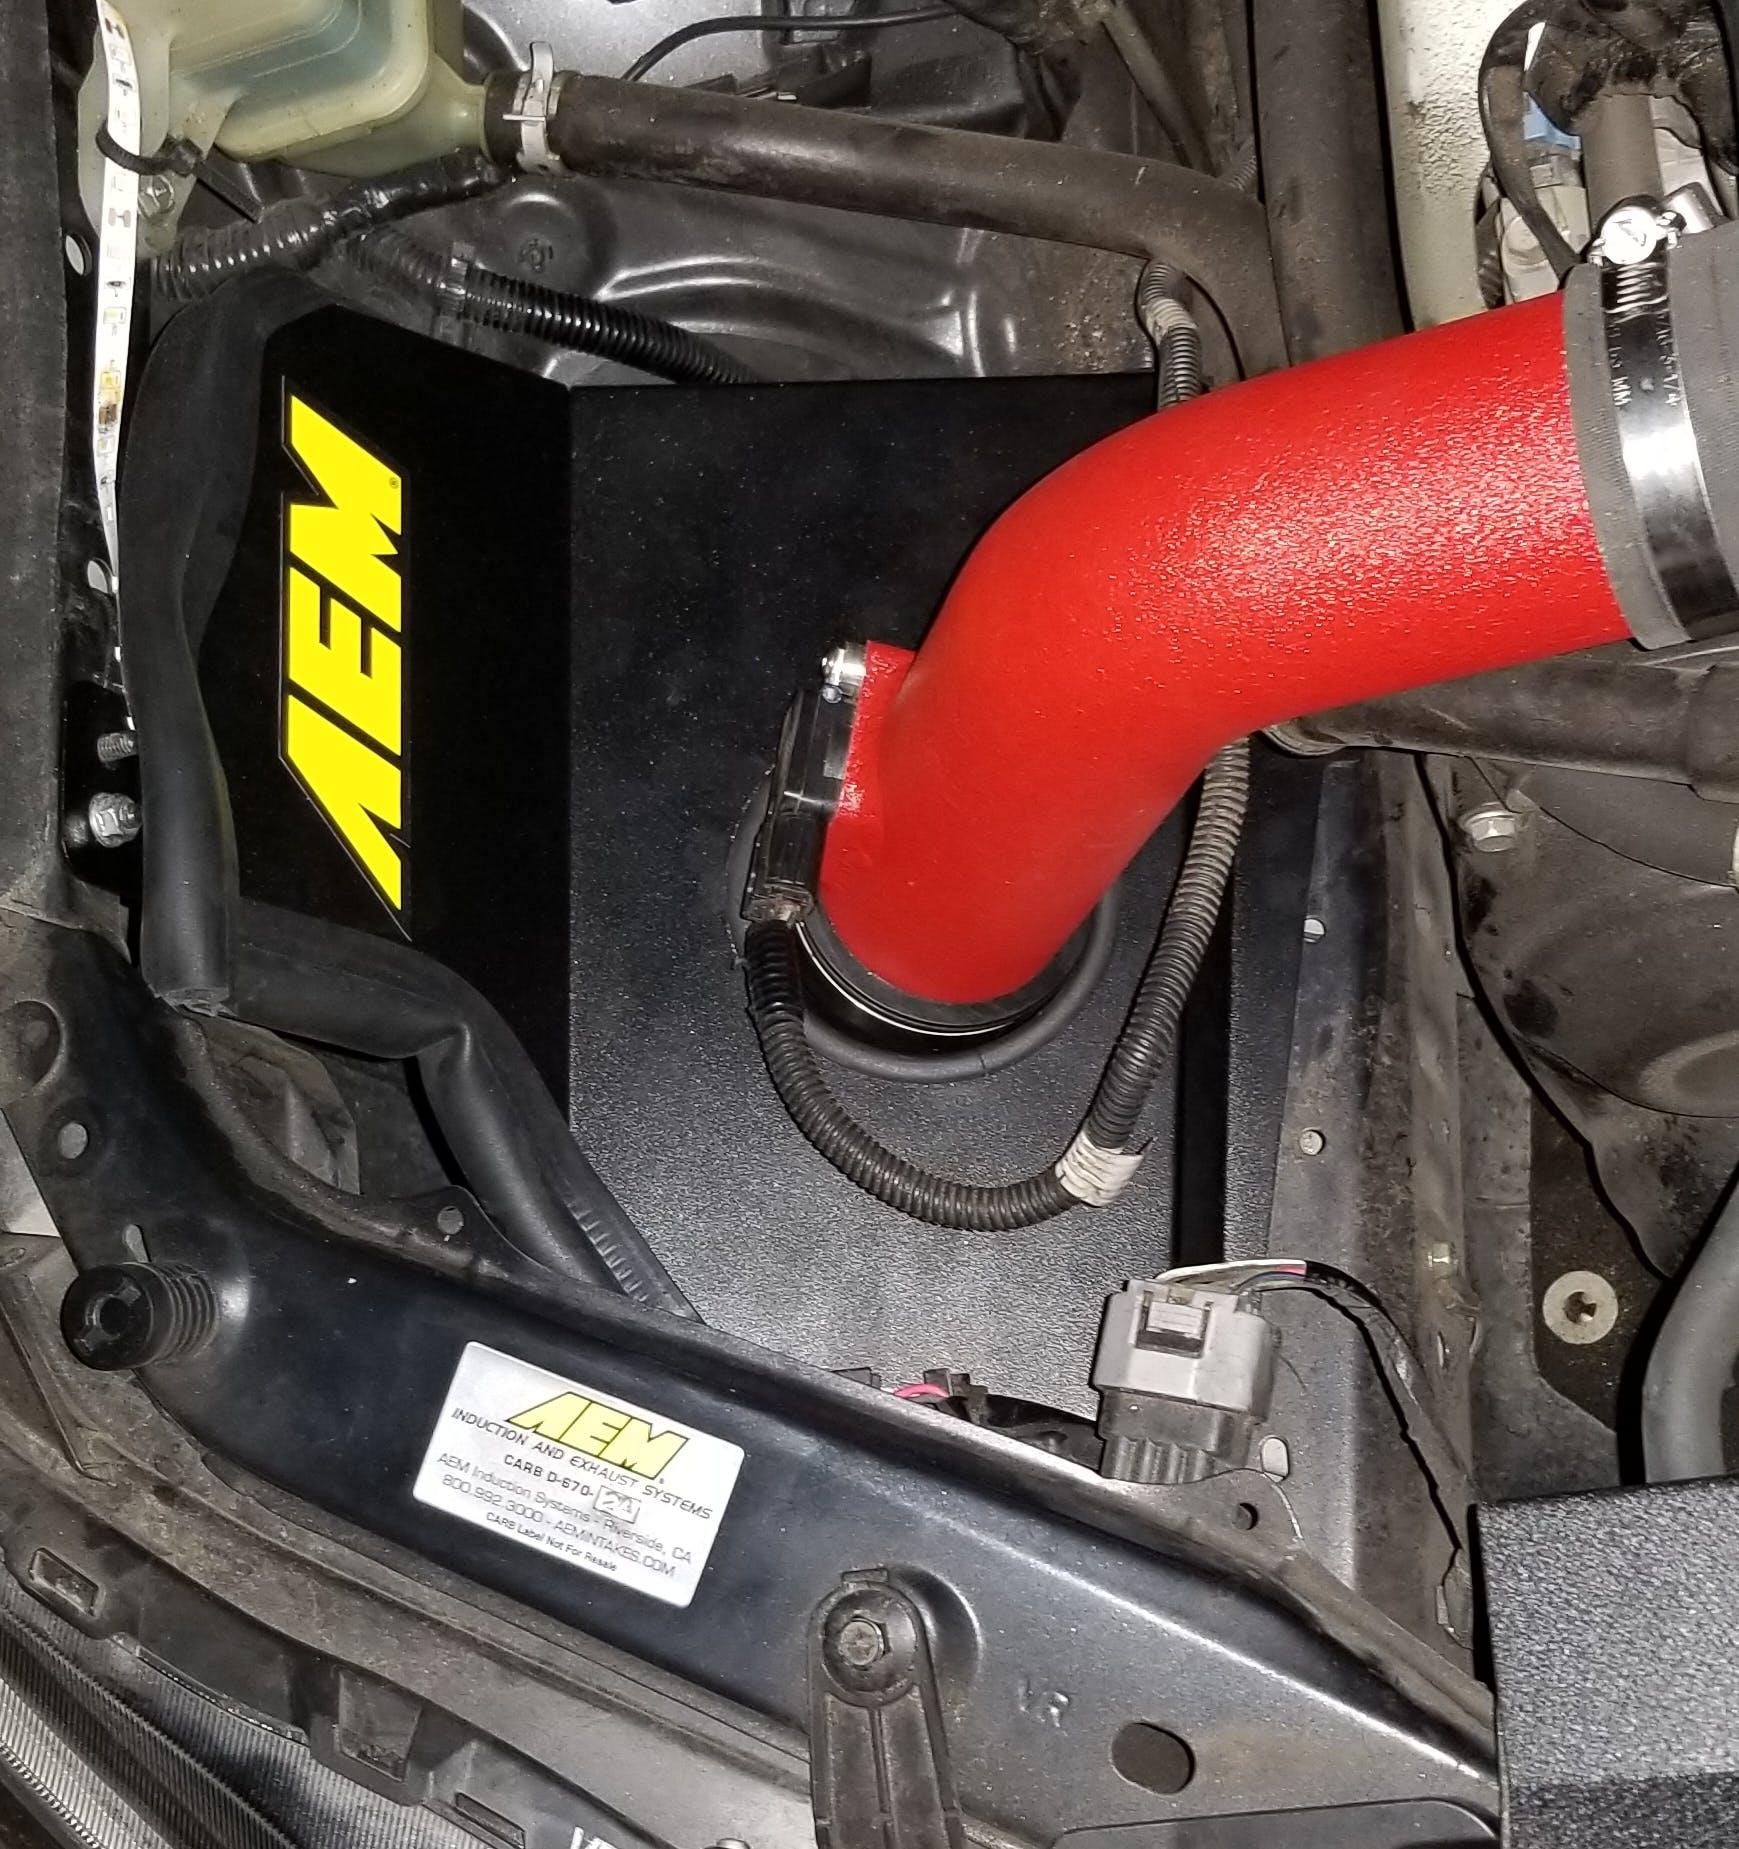 STi AEM 21-735WB Cold Air Intake System for 2015 Subaru WRX